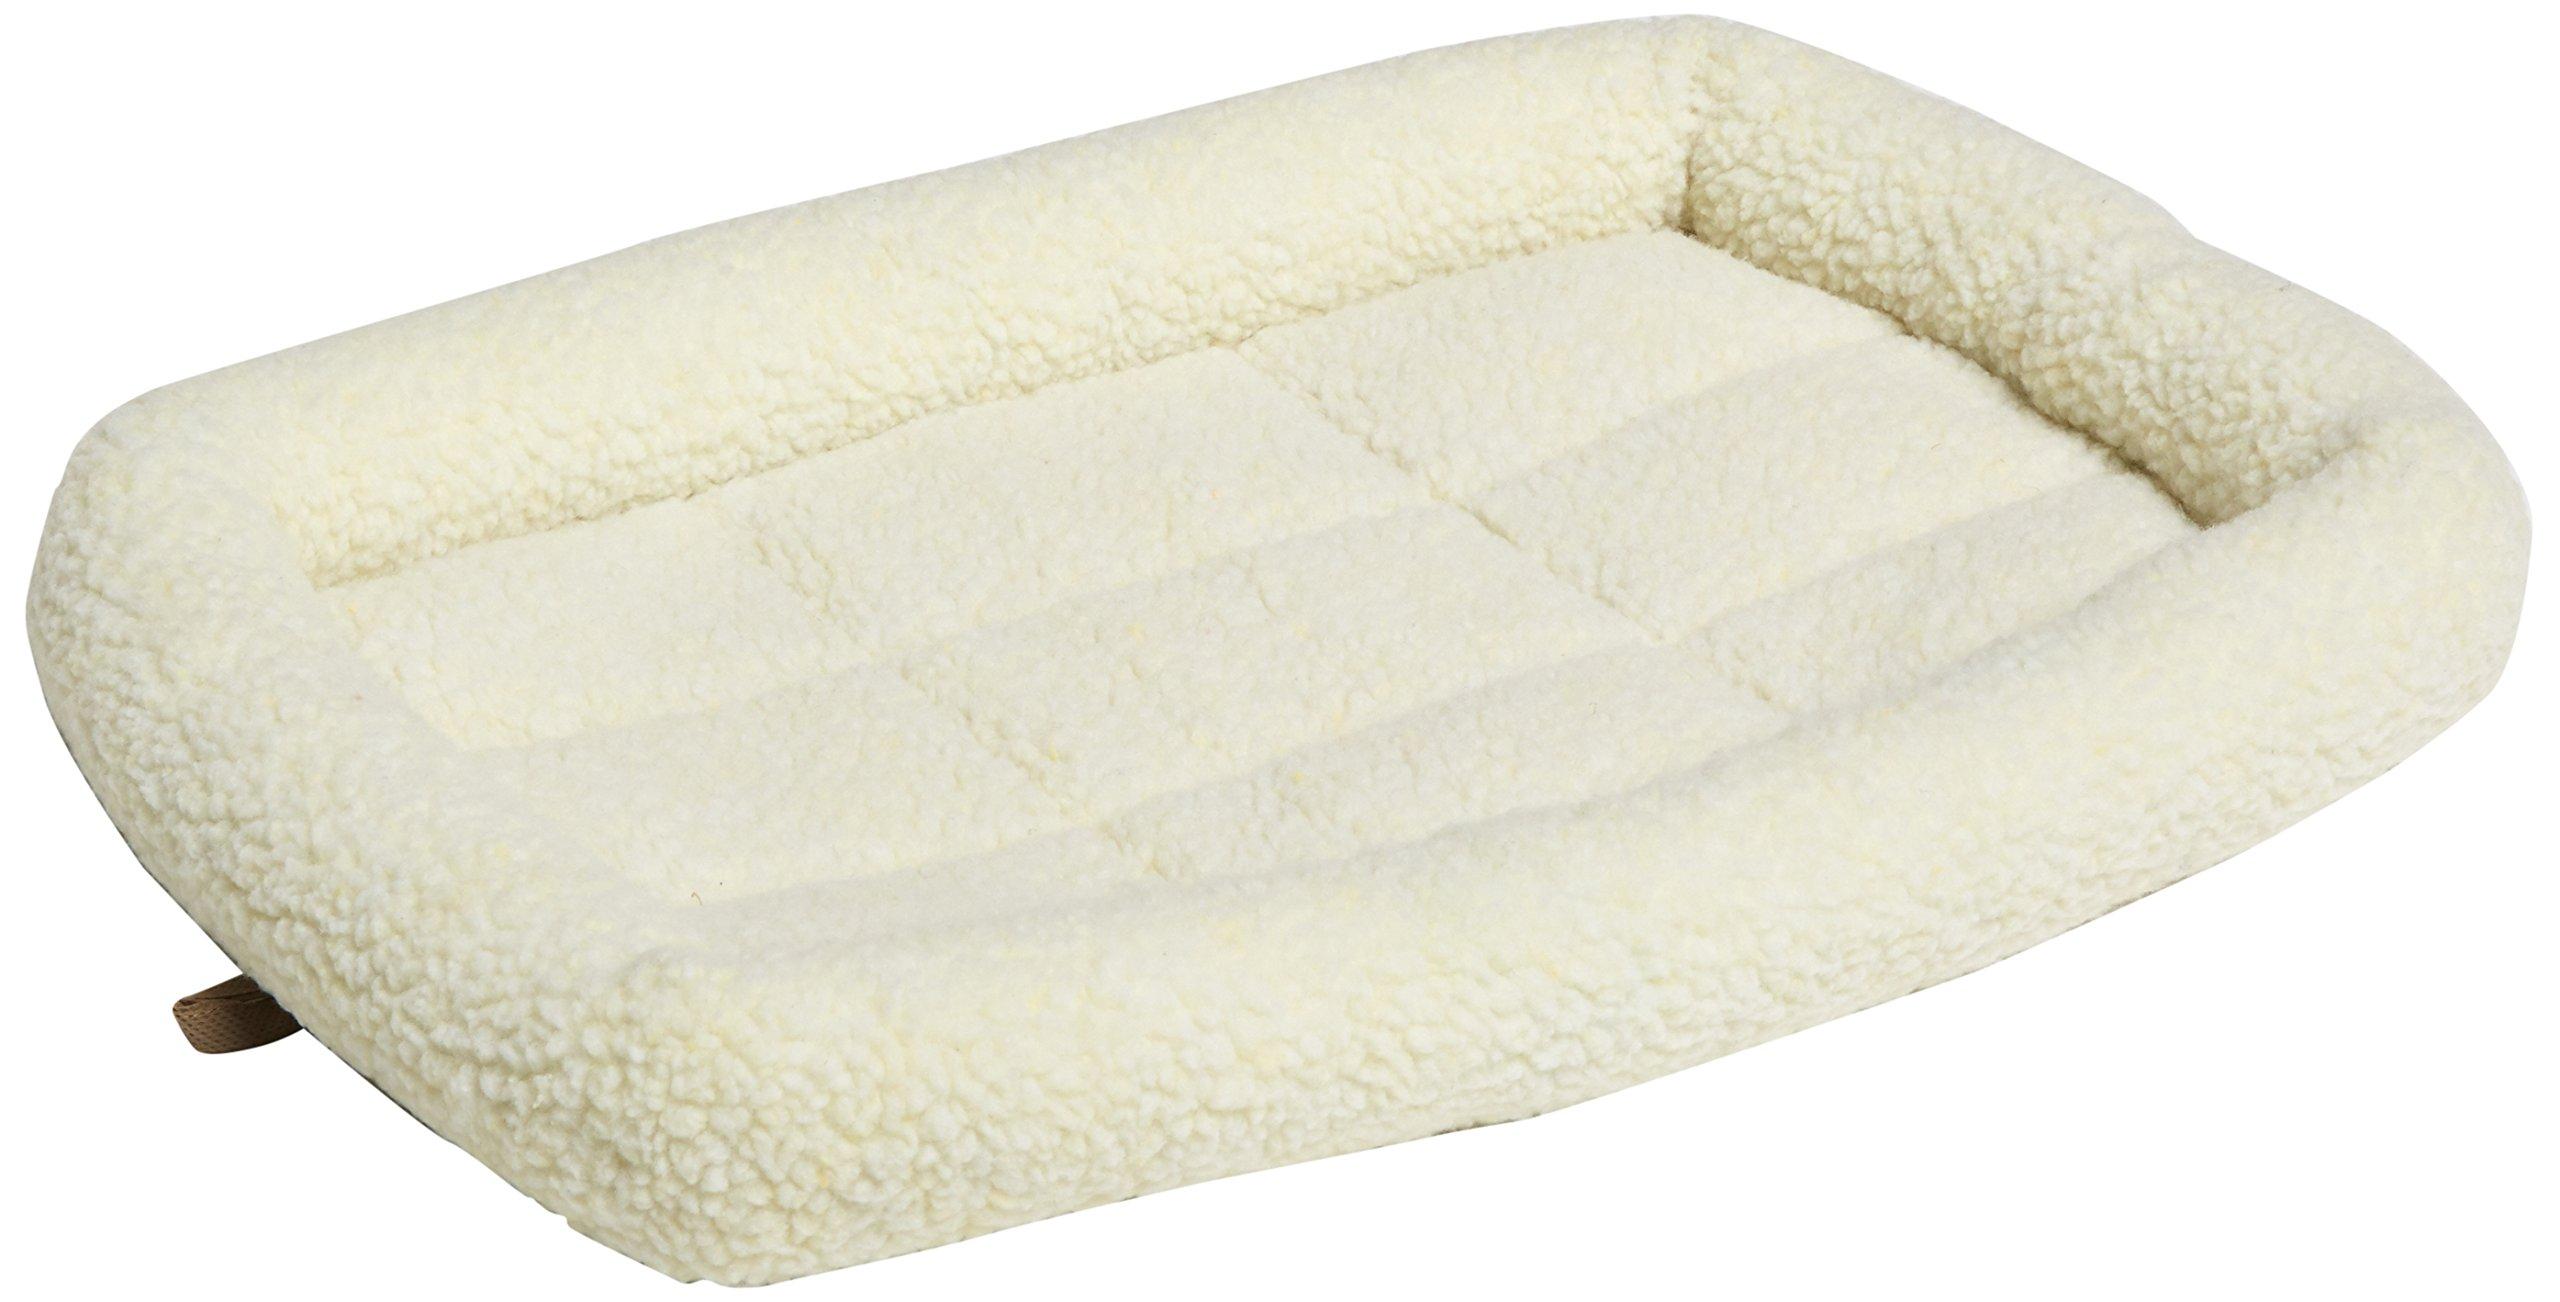 AmazonBasics Padded Pet Bolster Bed - 22 x 15 inches